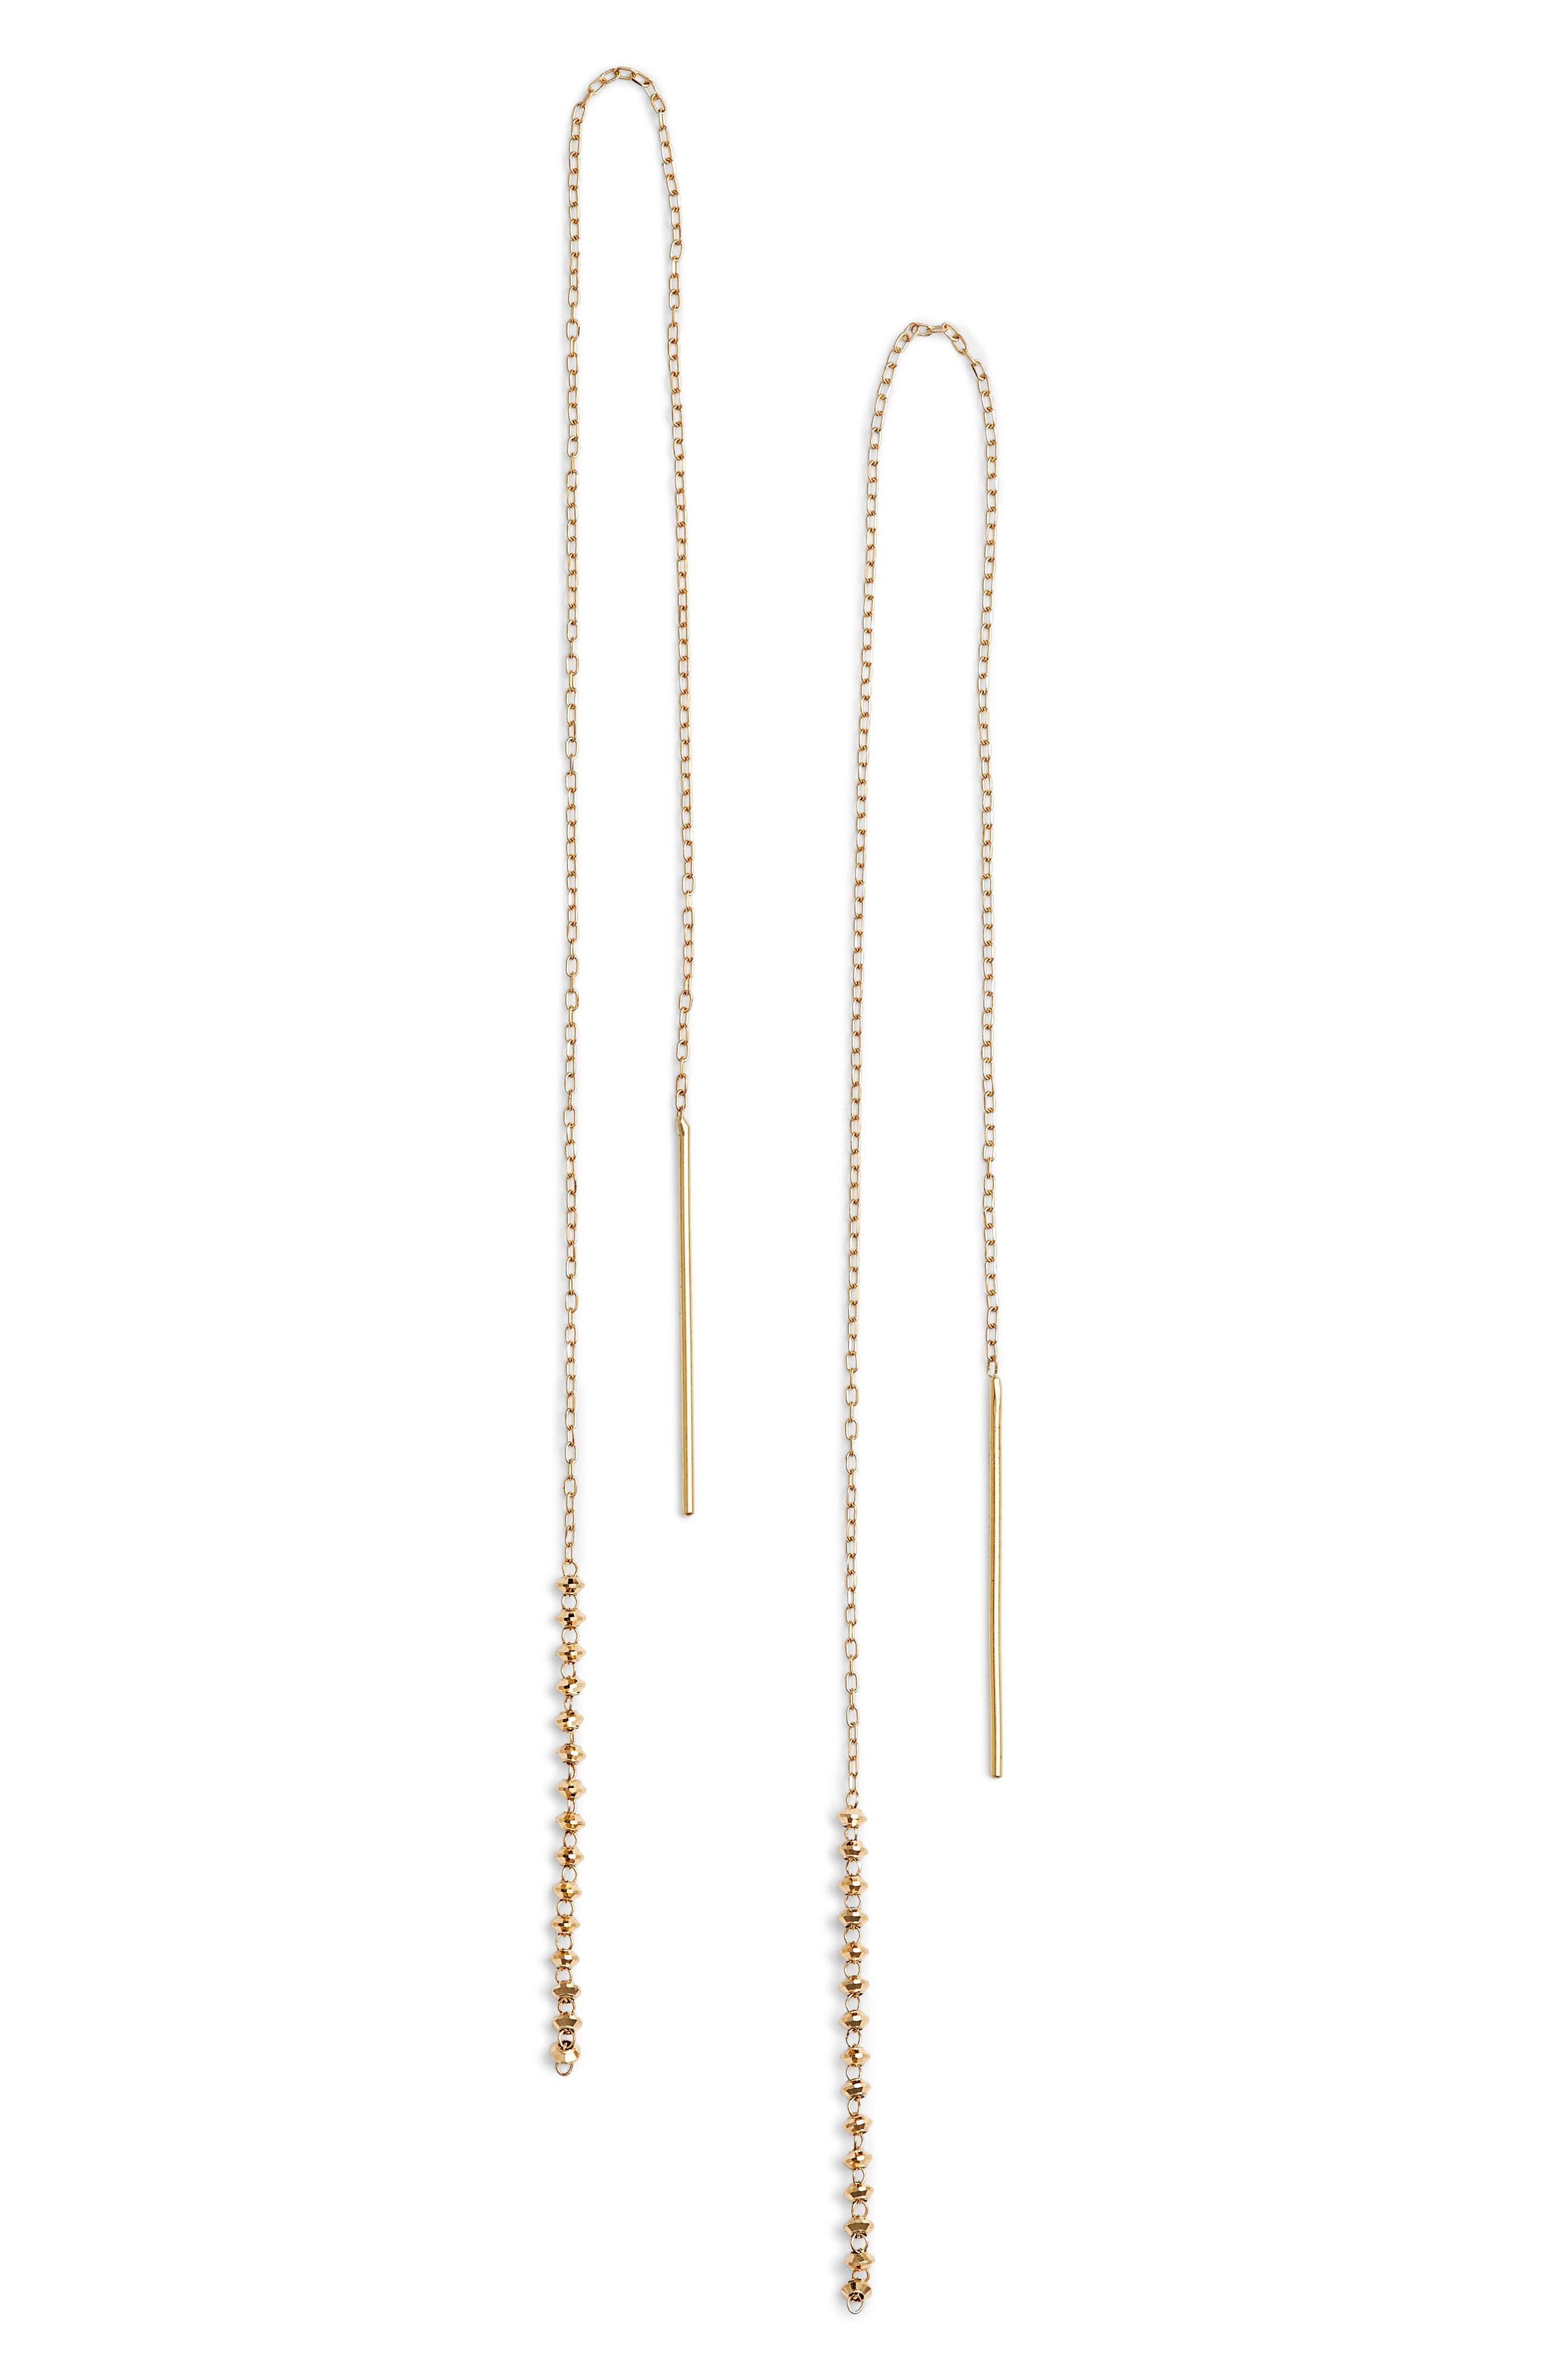 Long Shimmer Threader Earrings,                         Main,                         color, Yellow Gold